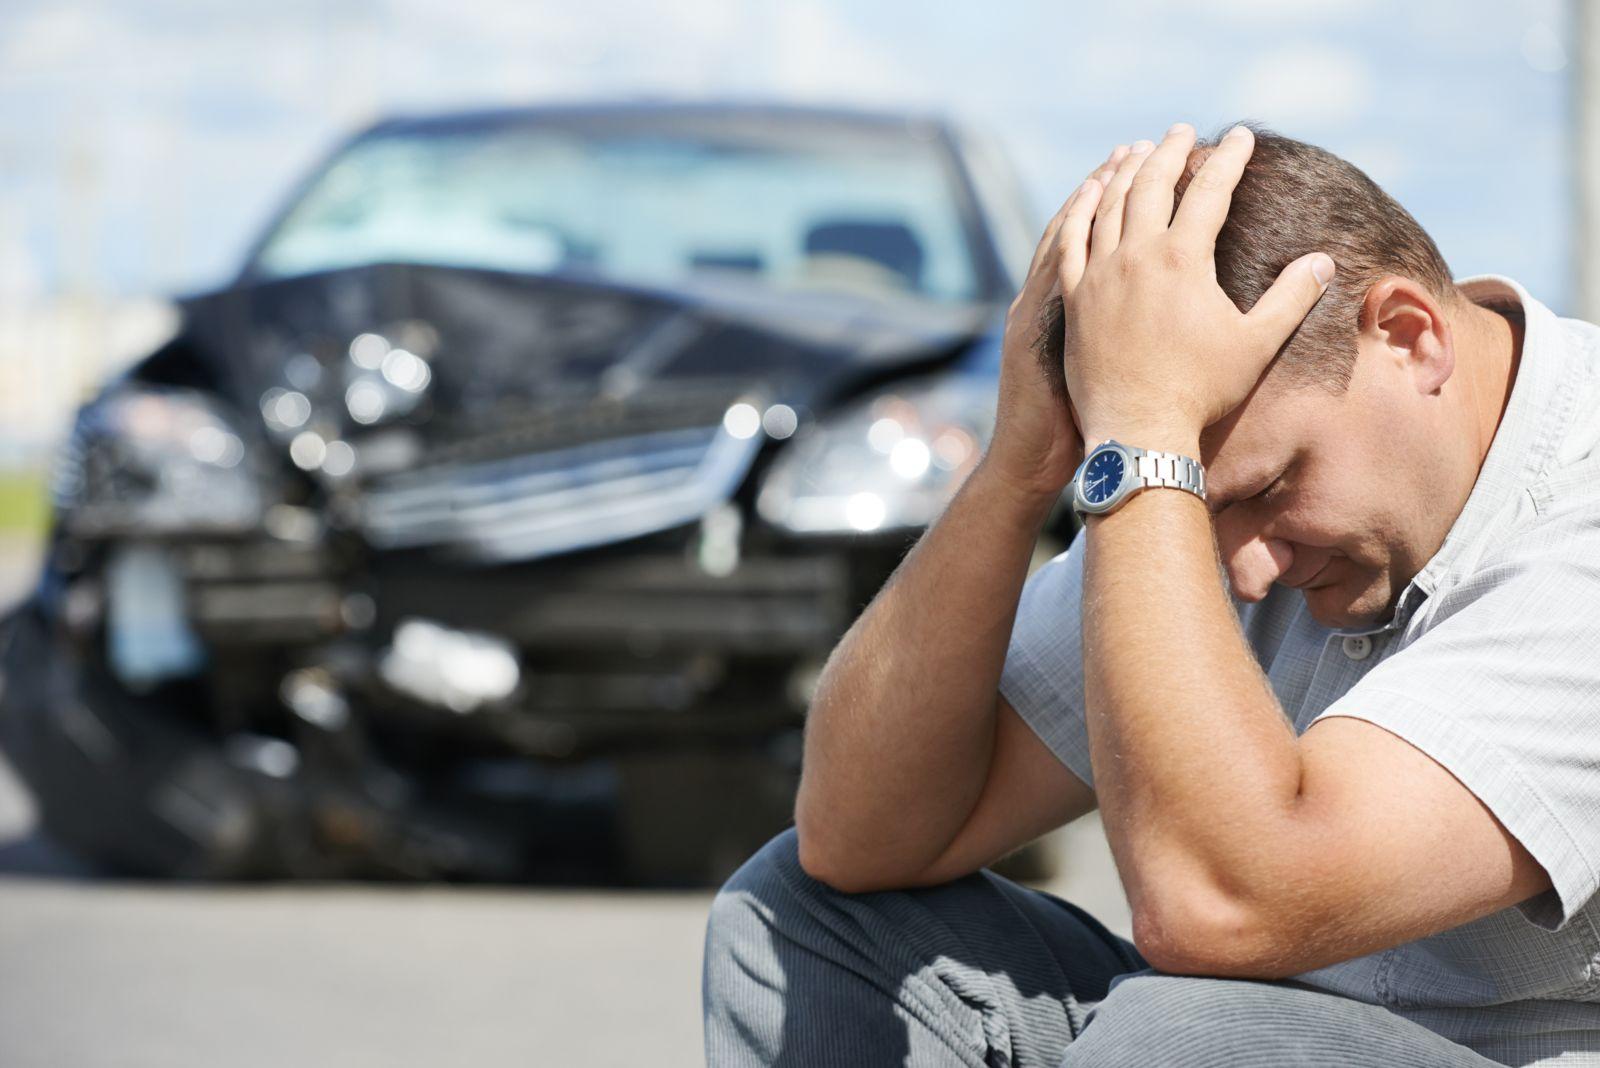 Man Upset After Car Accident